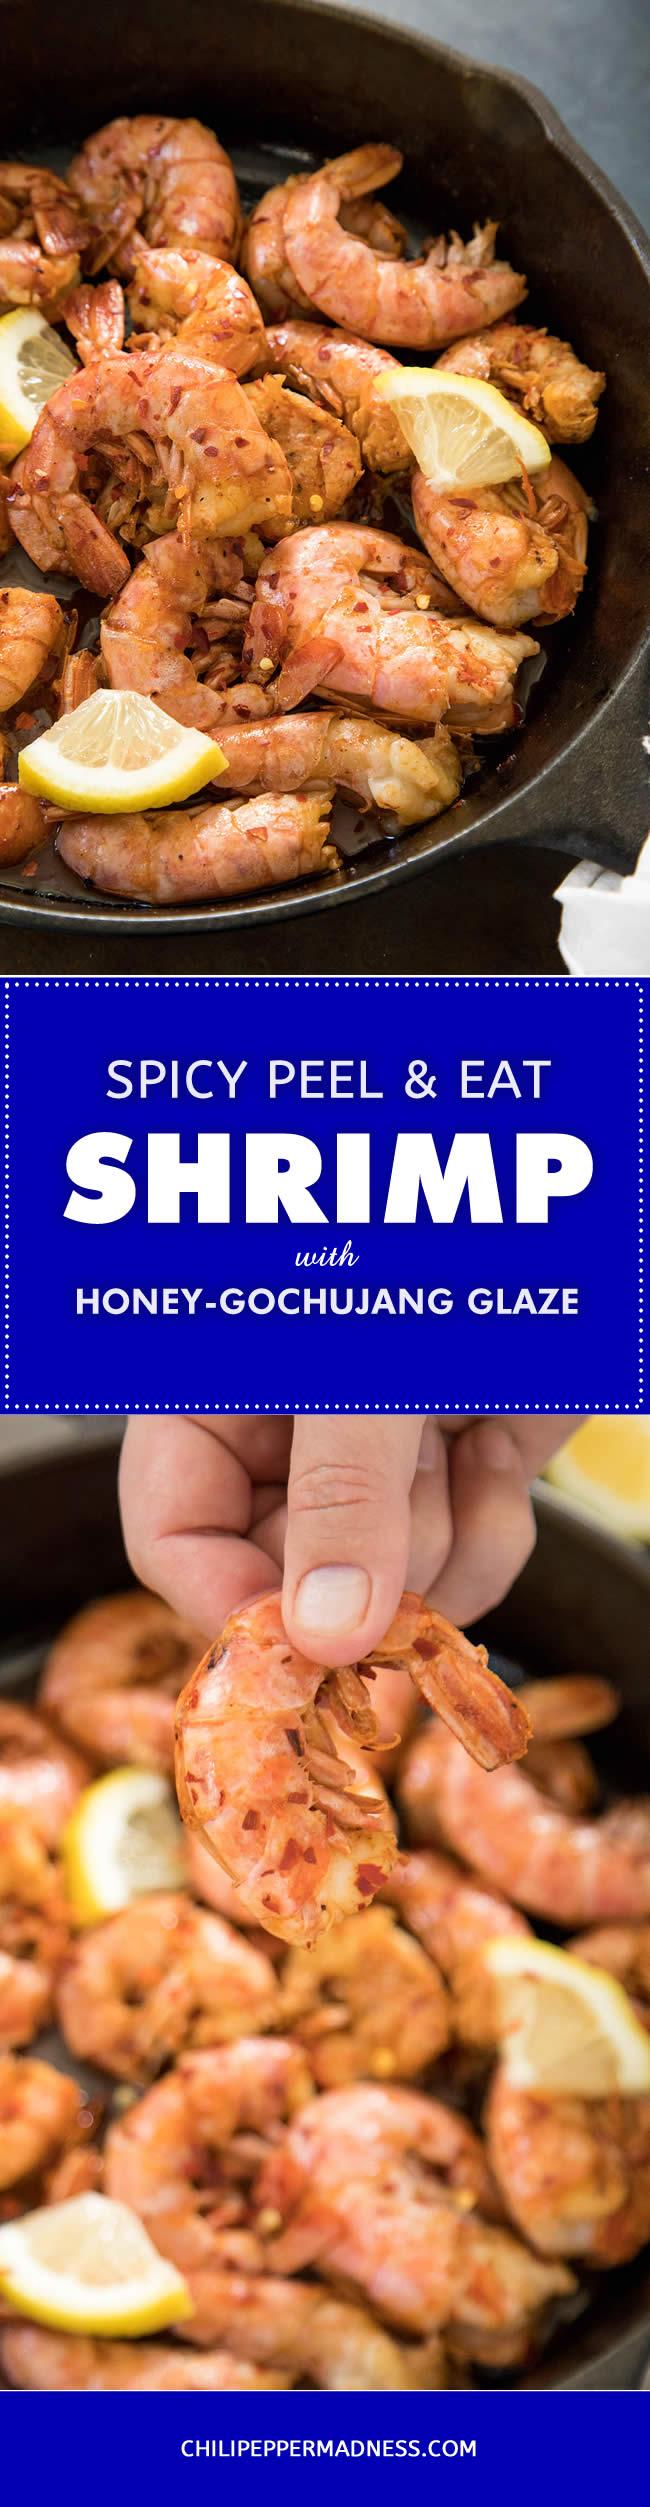 Spicy Peel-and-Eat Shrimp with Honey-Gochujang Glaze - Recipe